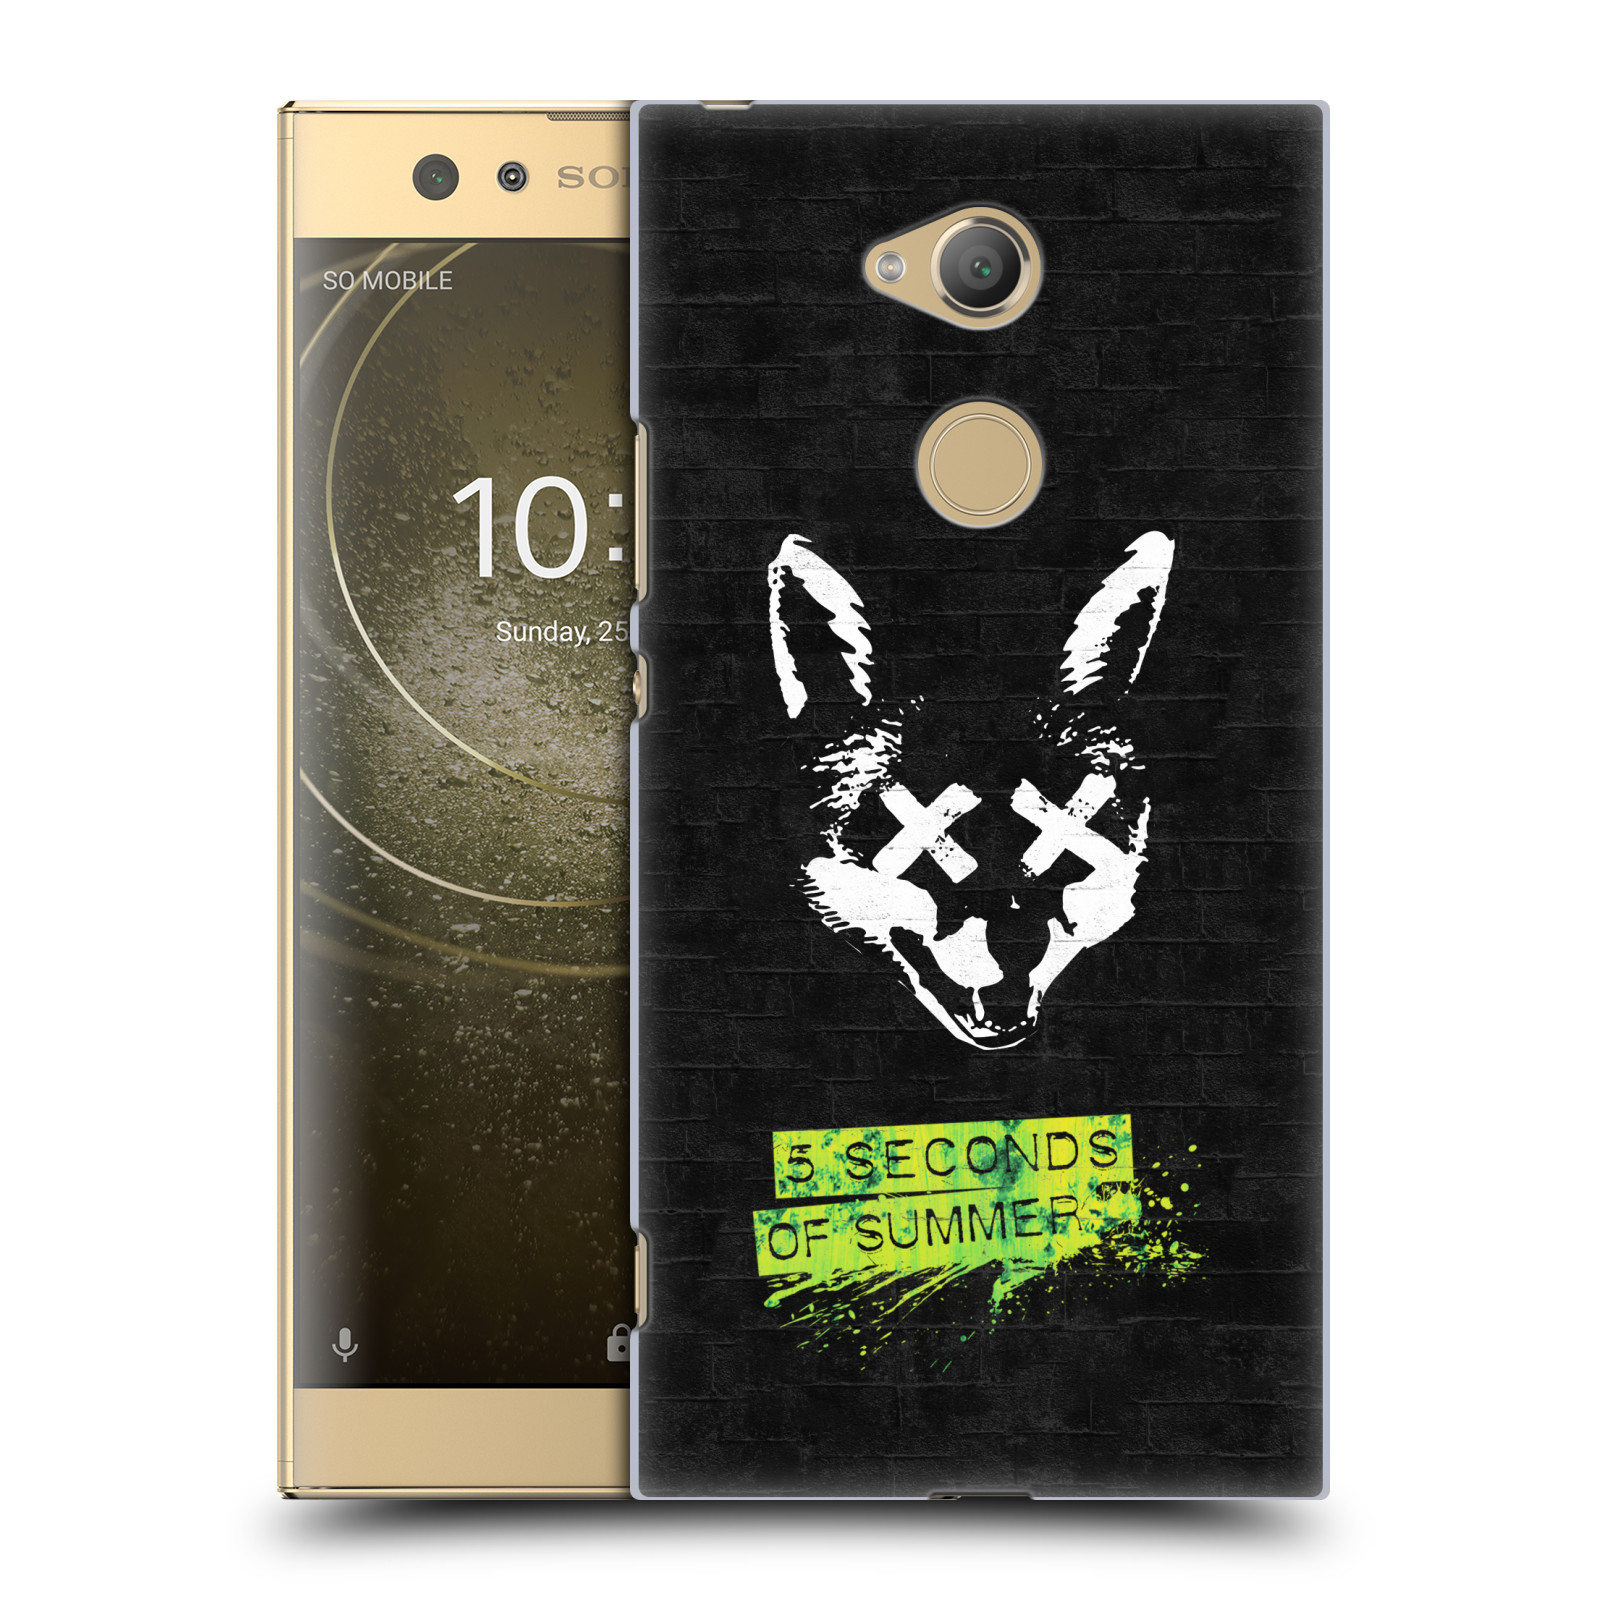 Plastové pouzdro na mobil Sony Xperia XA2 Ultra - Head Case - 5 Seconds of Summer - Fox